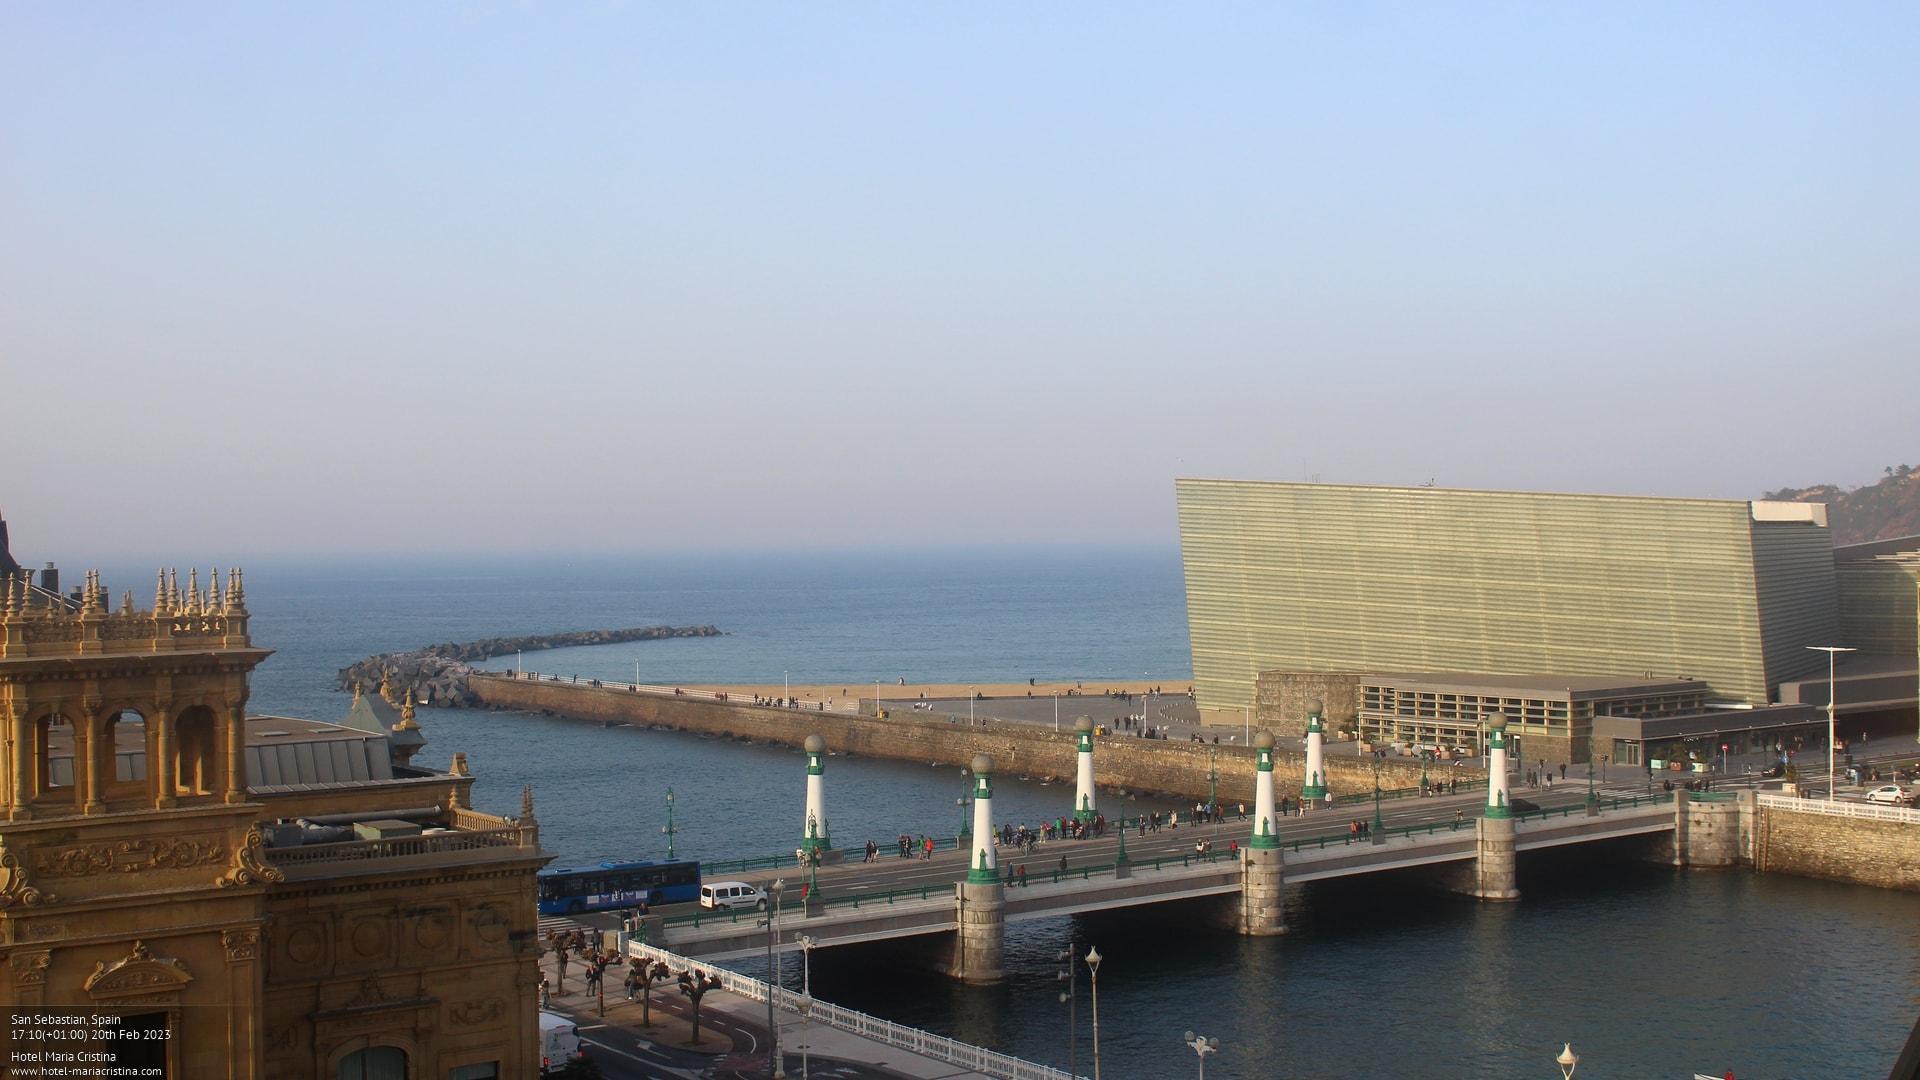 Webcam San Sebastian: View from Hotel Maria Cristina